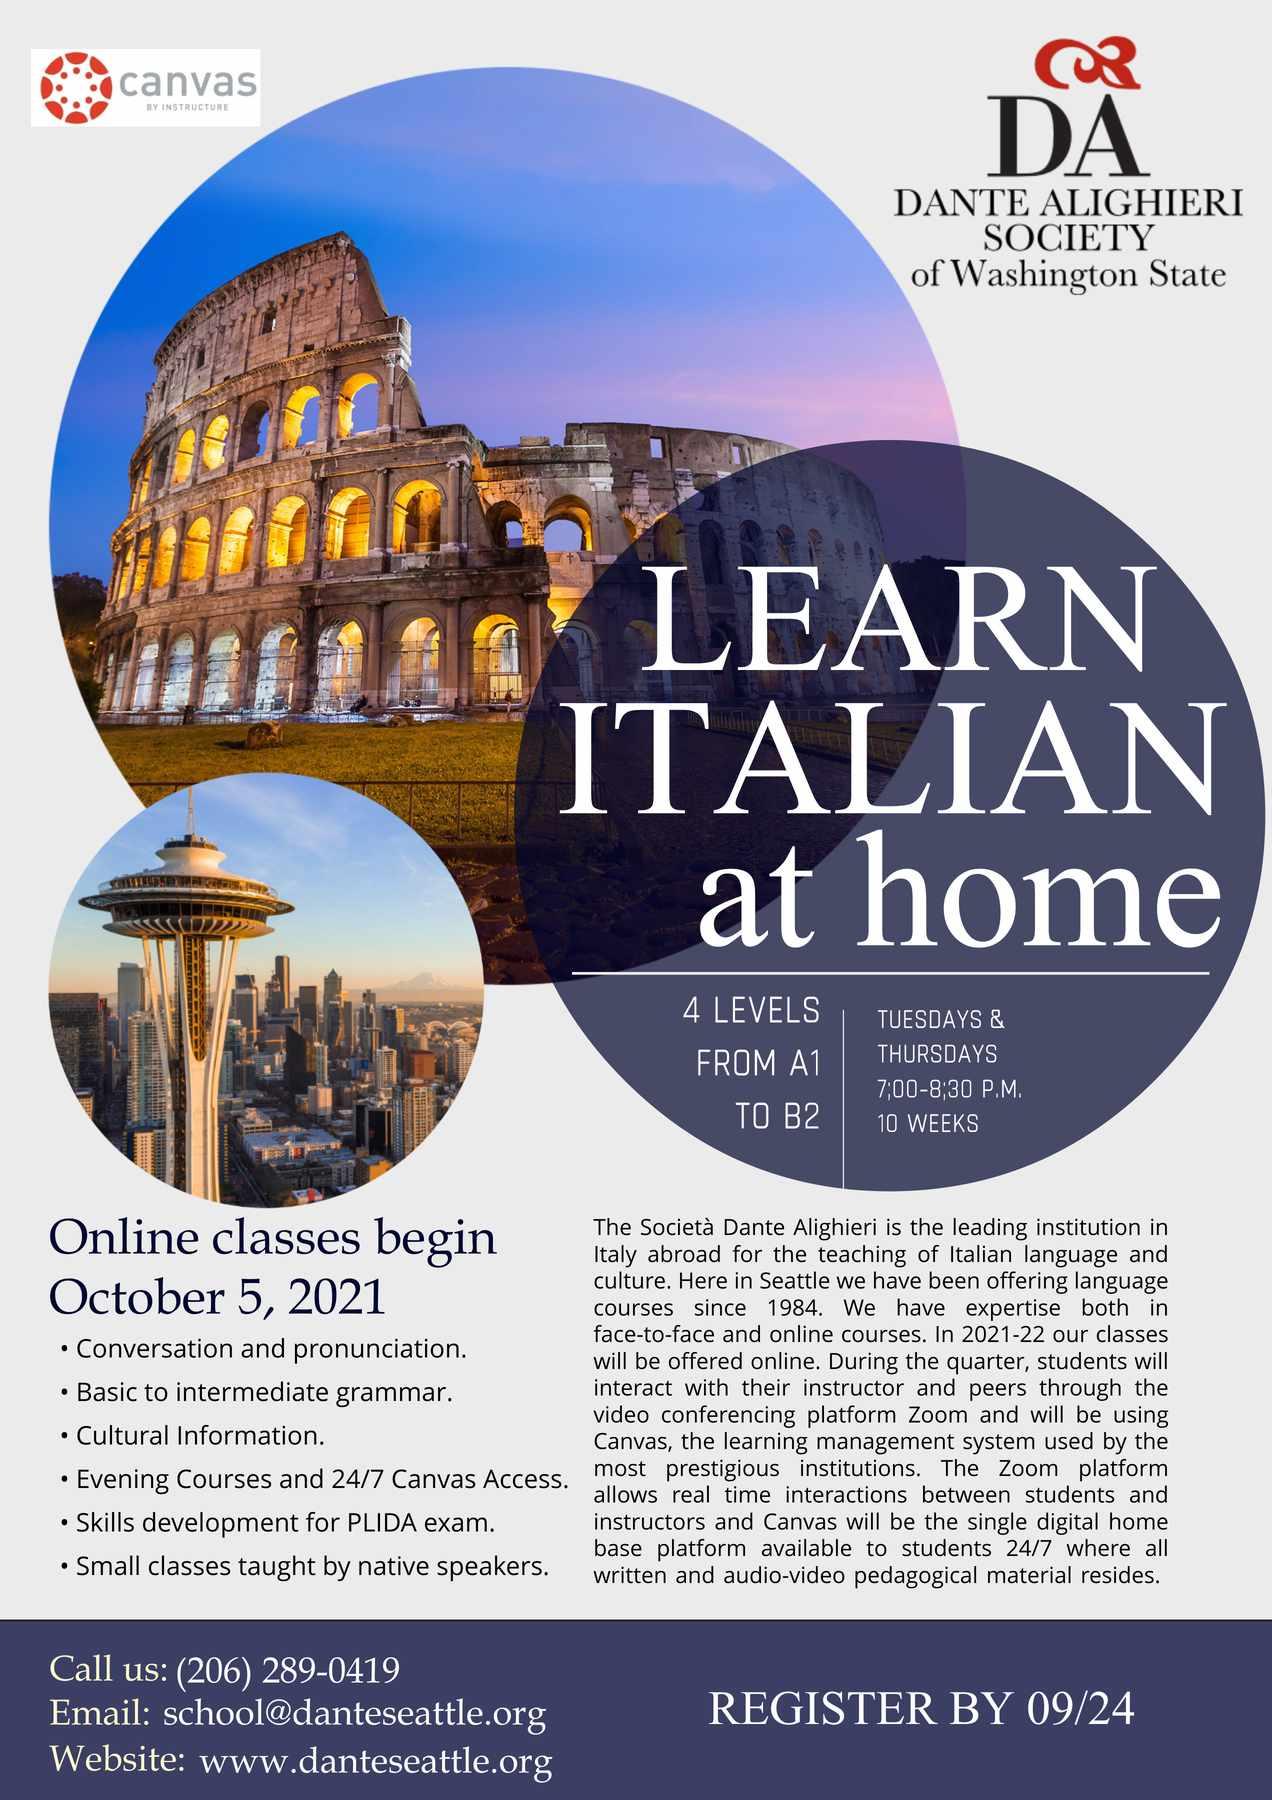 Fall 2021 Italian Language Classes